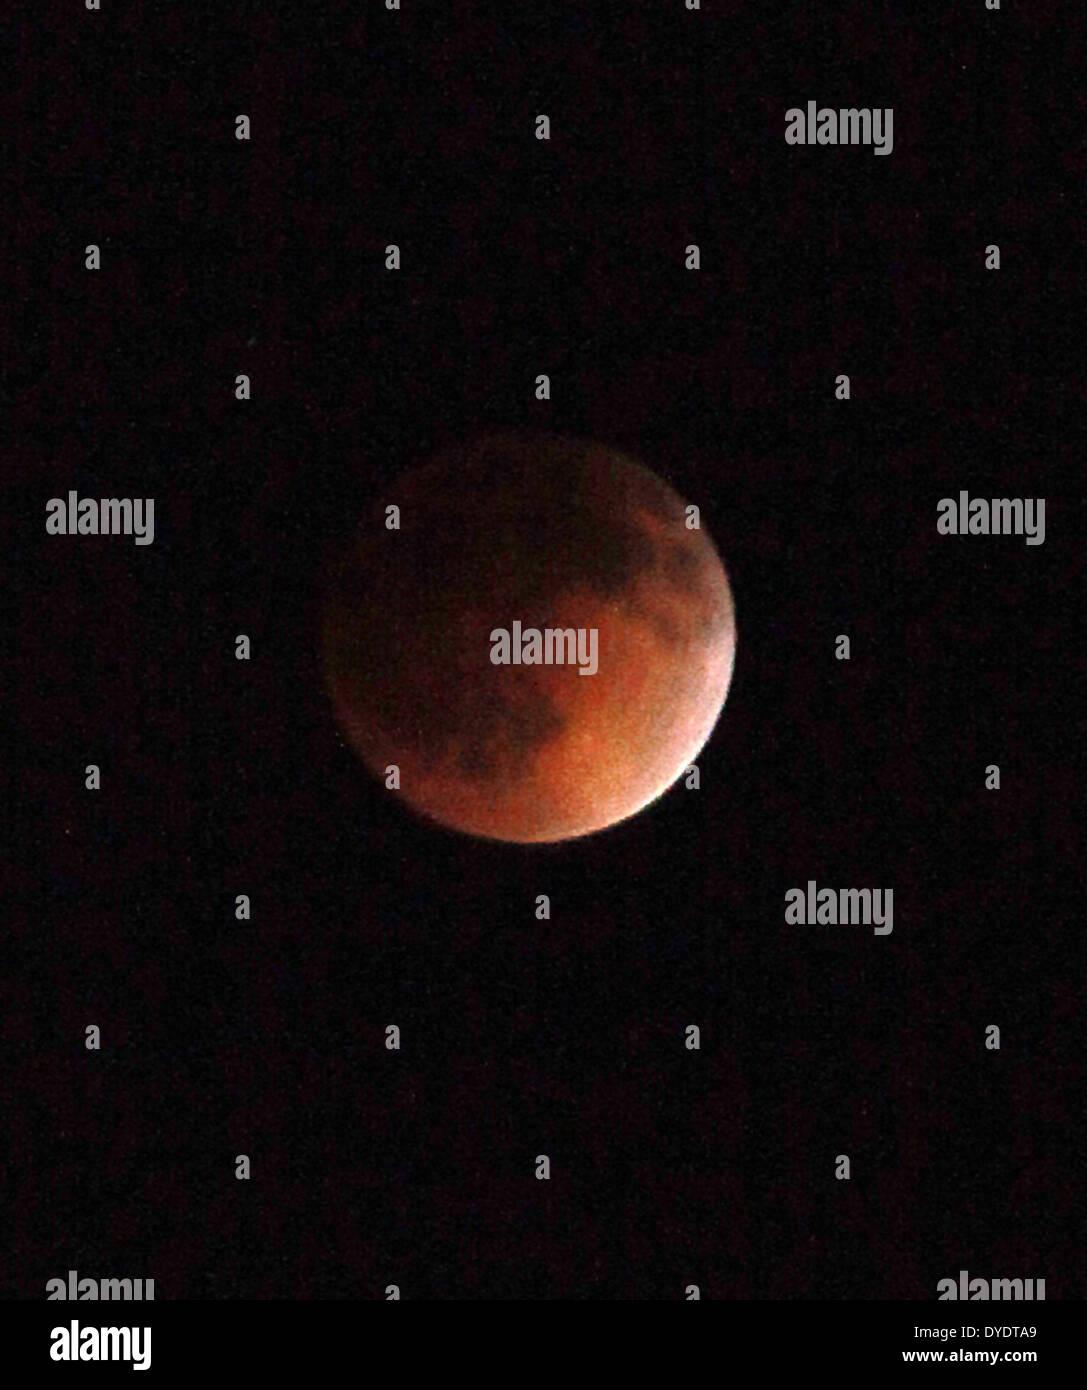 Eclipse Las Vegas >> Las Vegas Nevada Usa 15th Apr 2014 A Total Lunar Eclipse Seen